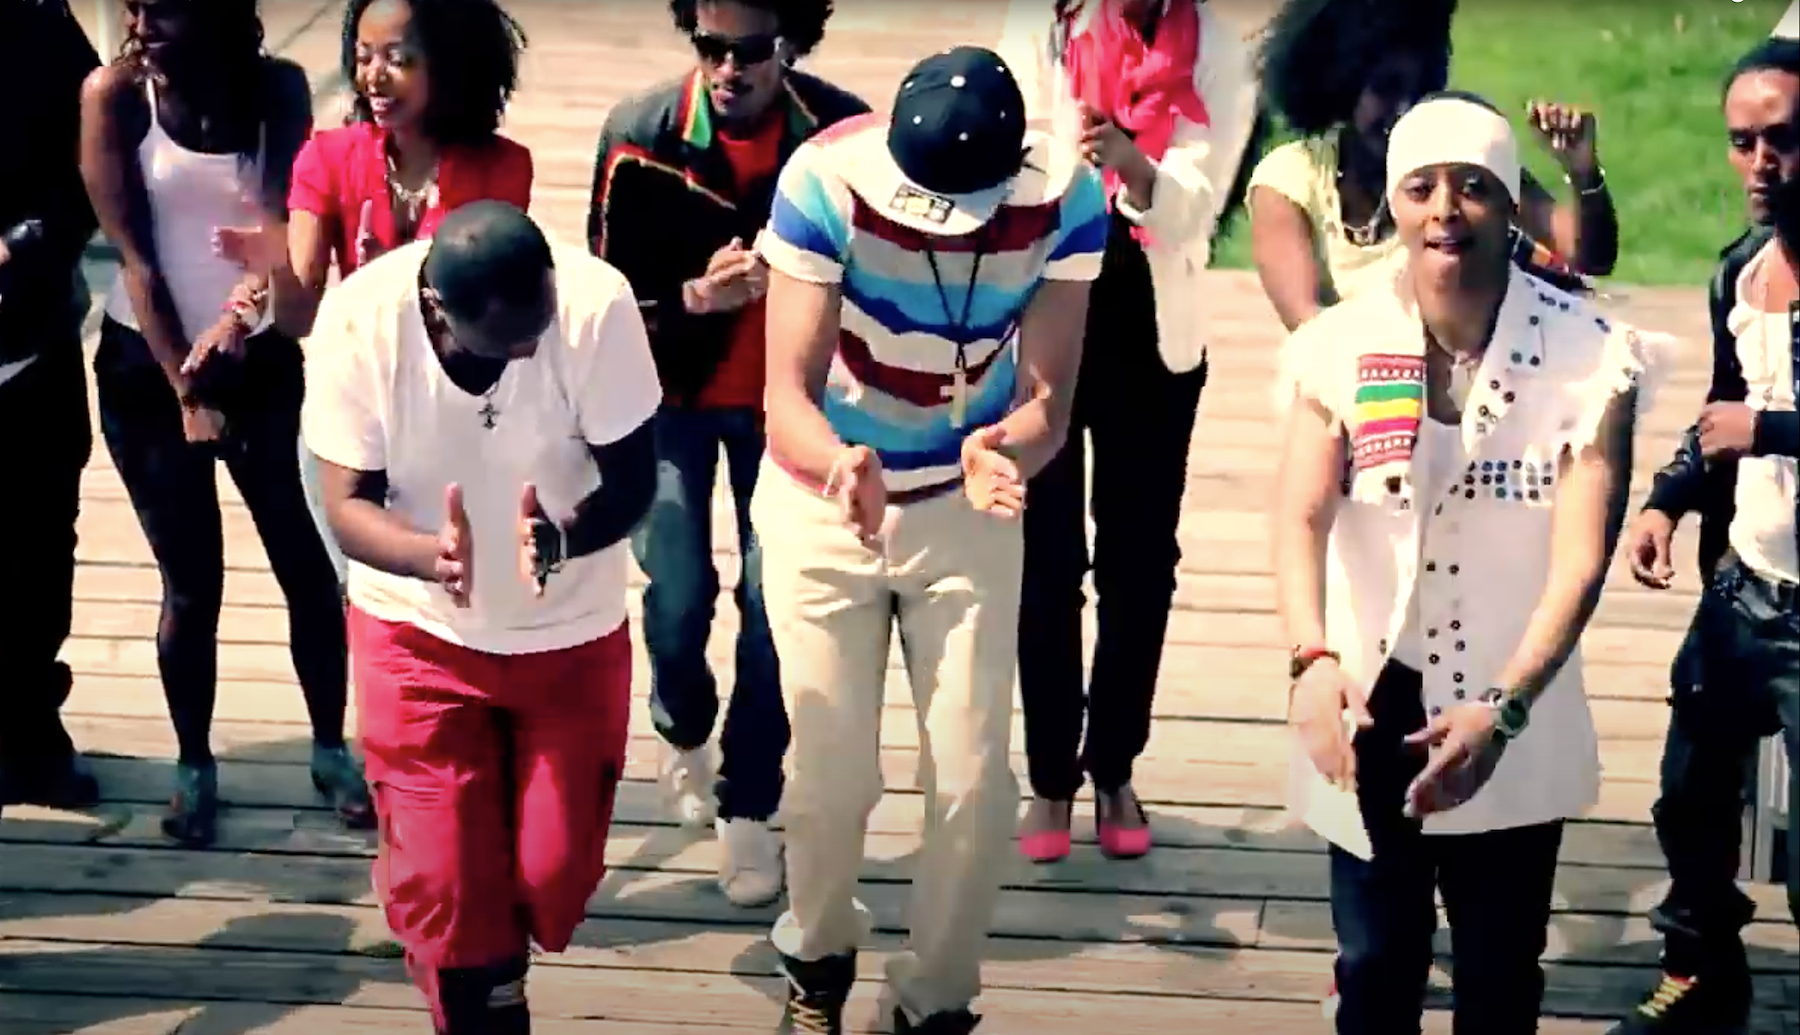 afrique nouvelle musique africa new music toronto canada art arts african congo congolese arthur tongo thomas tumbu festival bana y'afrique Rawmny Wildcat Rasselas Ethiopia